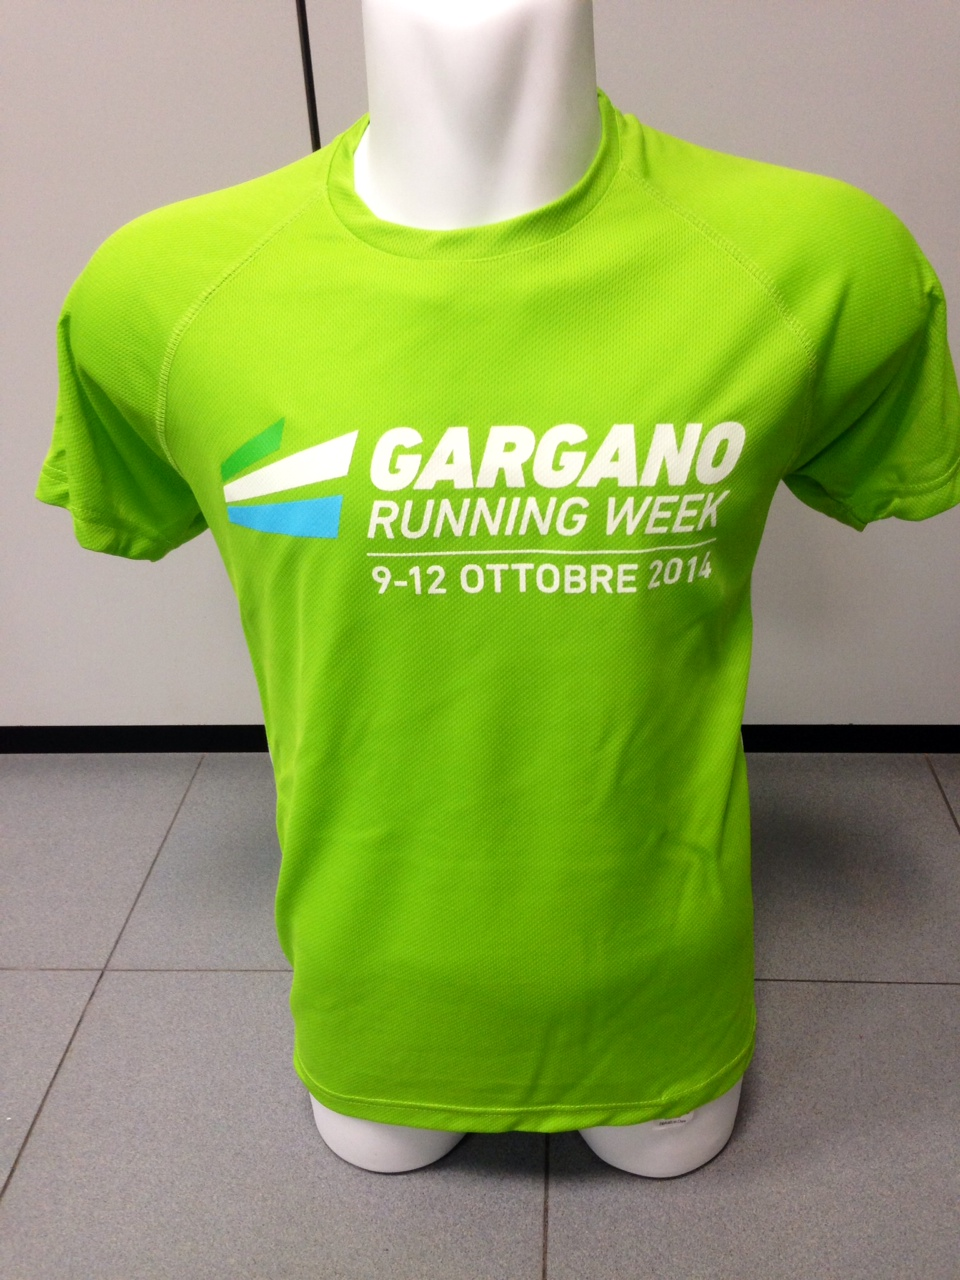 Gargano 2